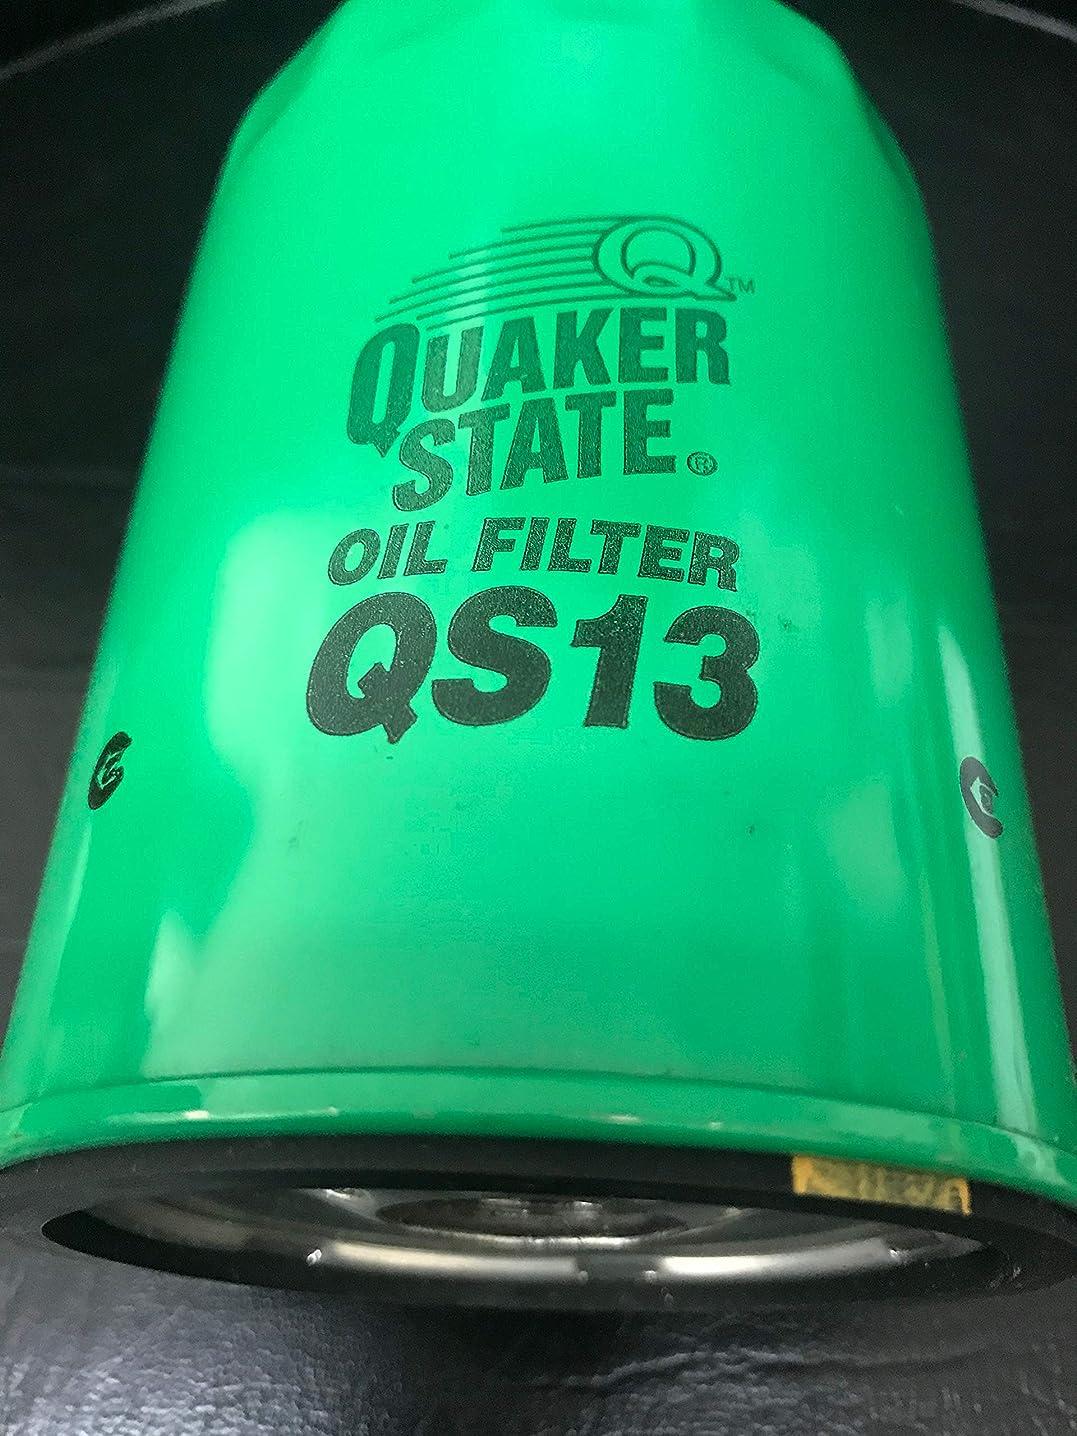 QUAKER STATE QS13 OIL FILTER(PACK OF 1) REPLACES # PF1218 L3510 PH1218 L30040 PH13 PH5 51061 M1-302 PG4631